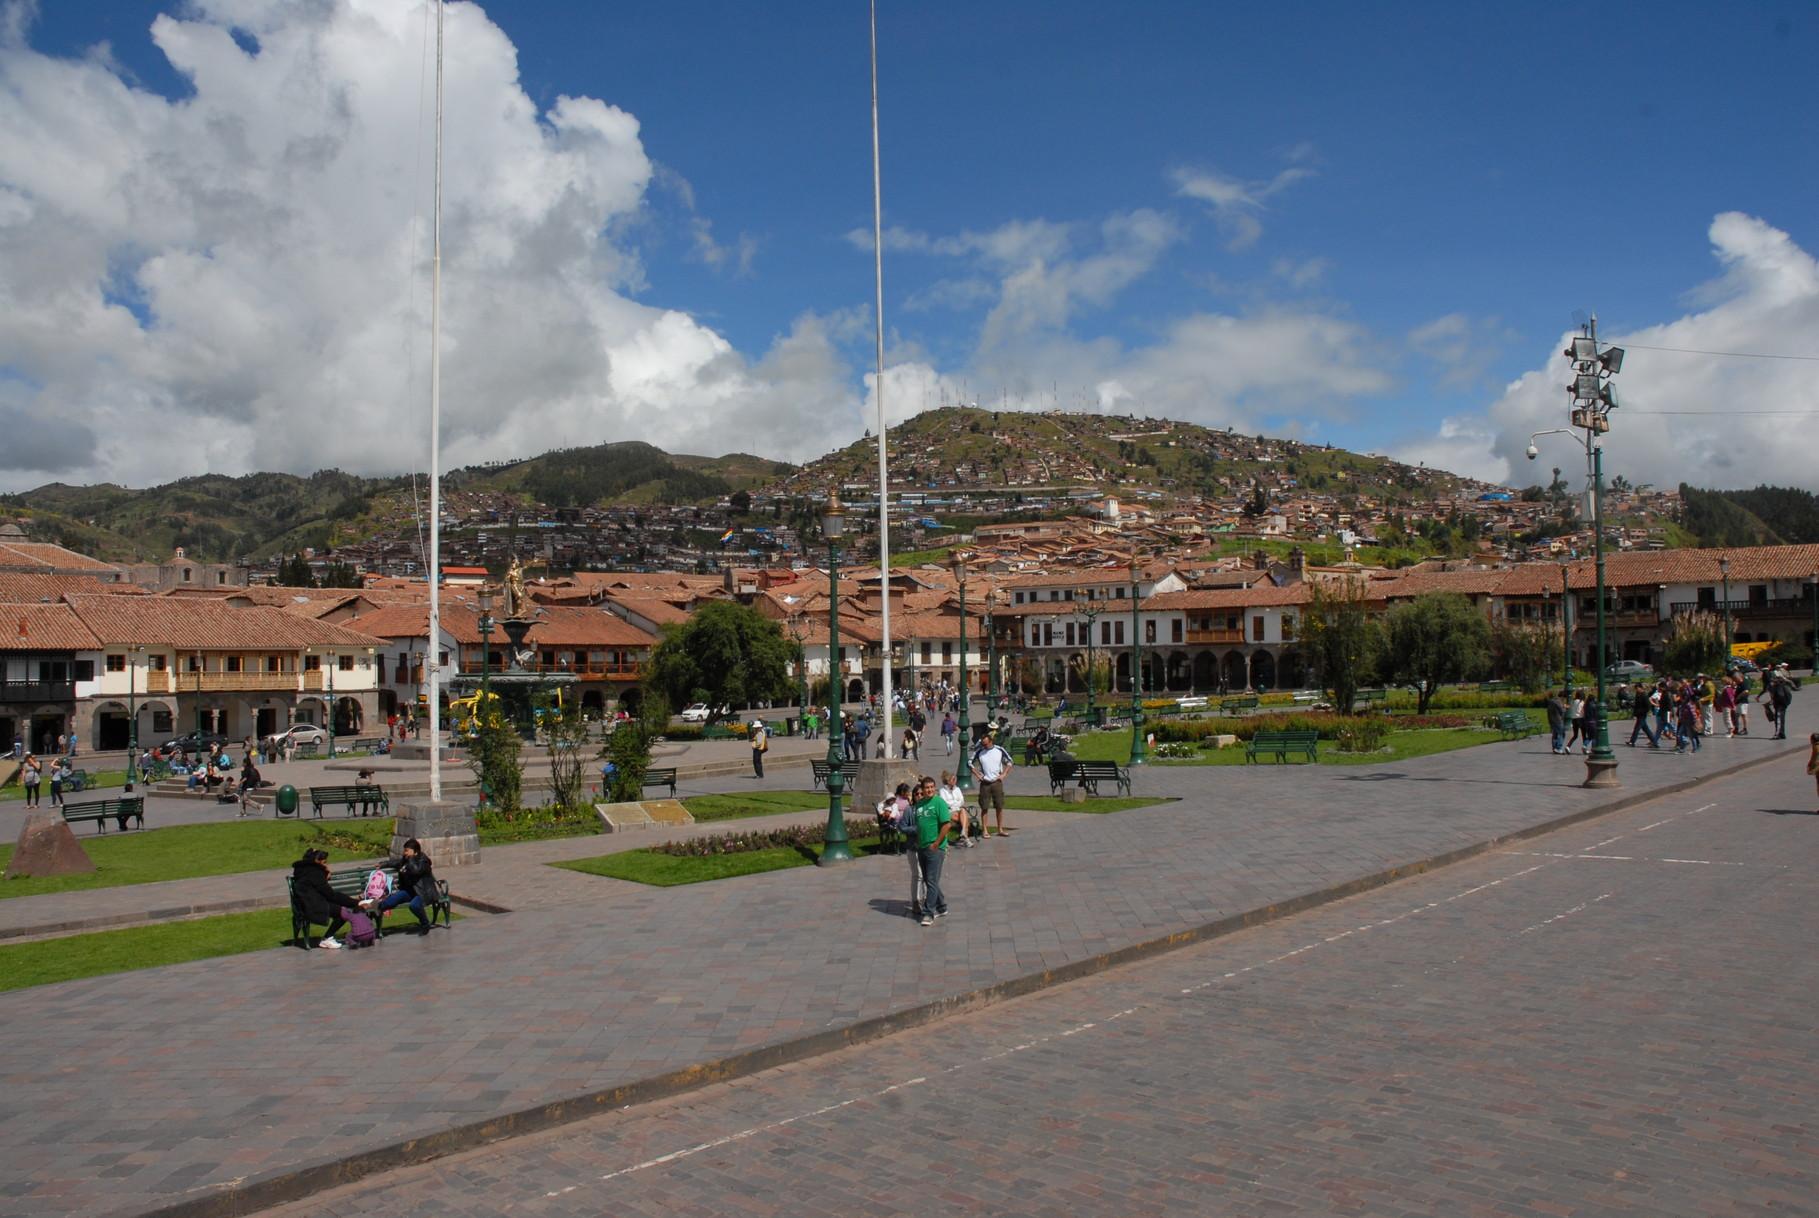 Die Plaza de Armas